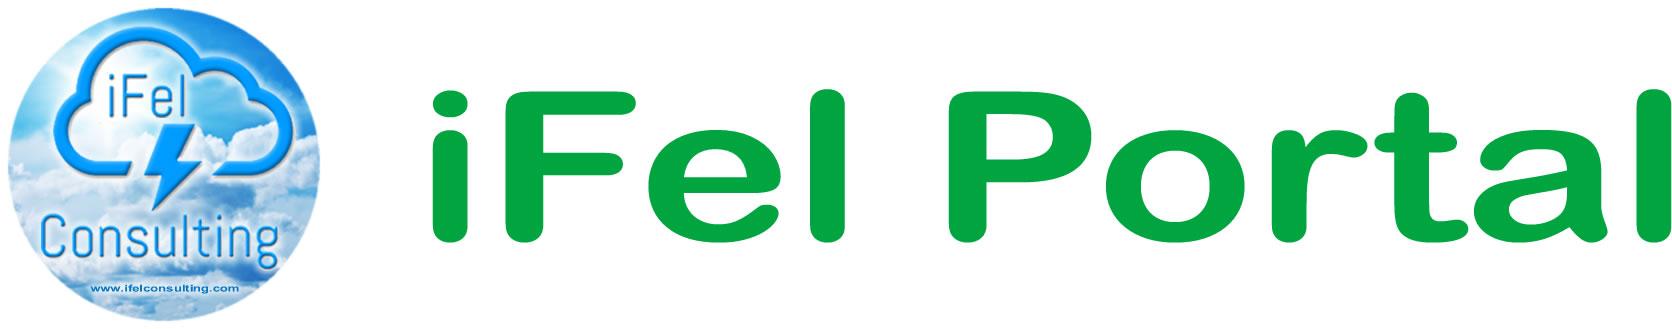 iFel Consulting Portal